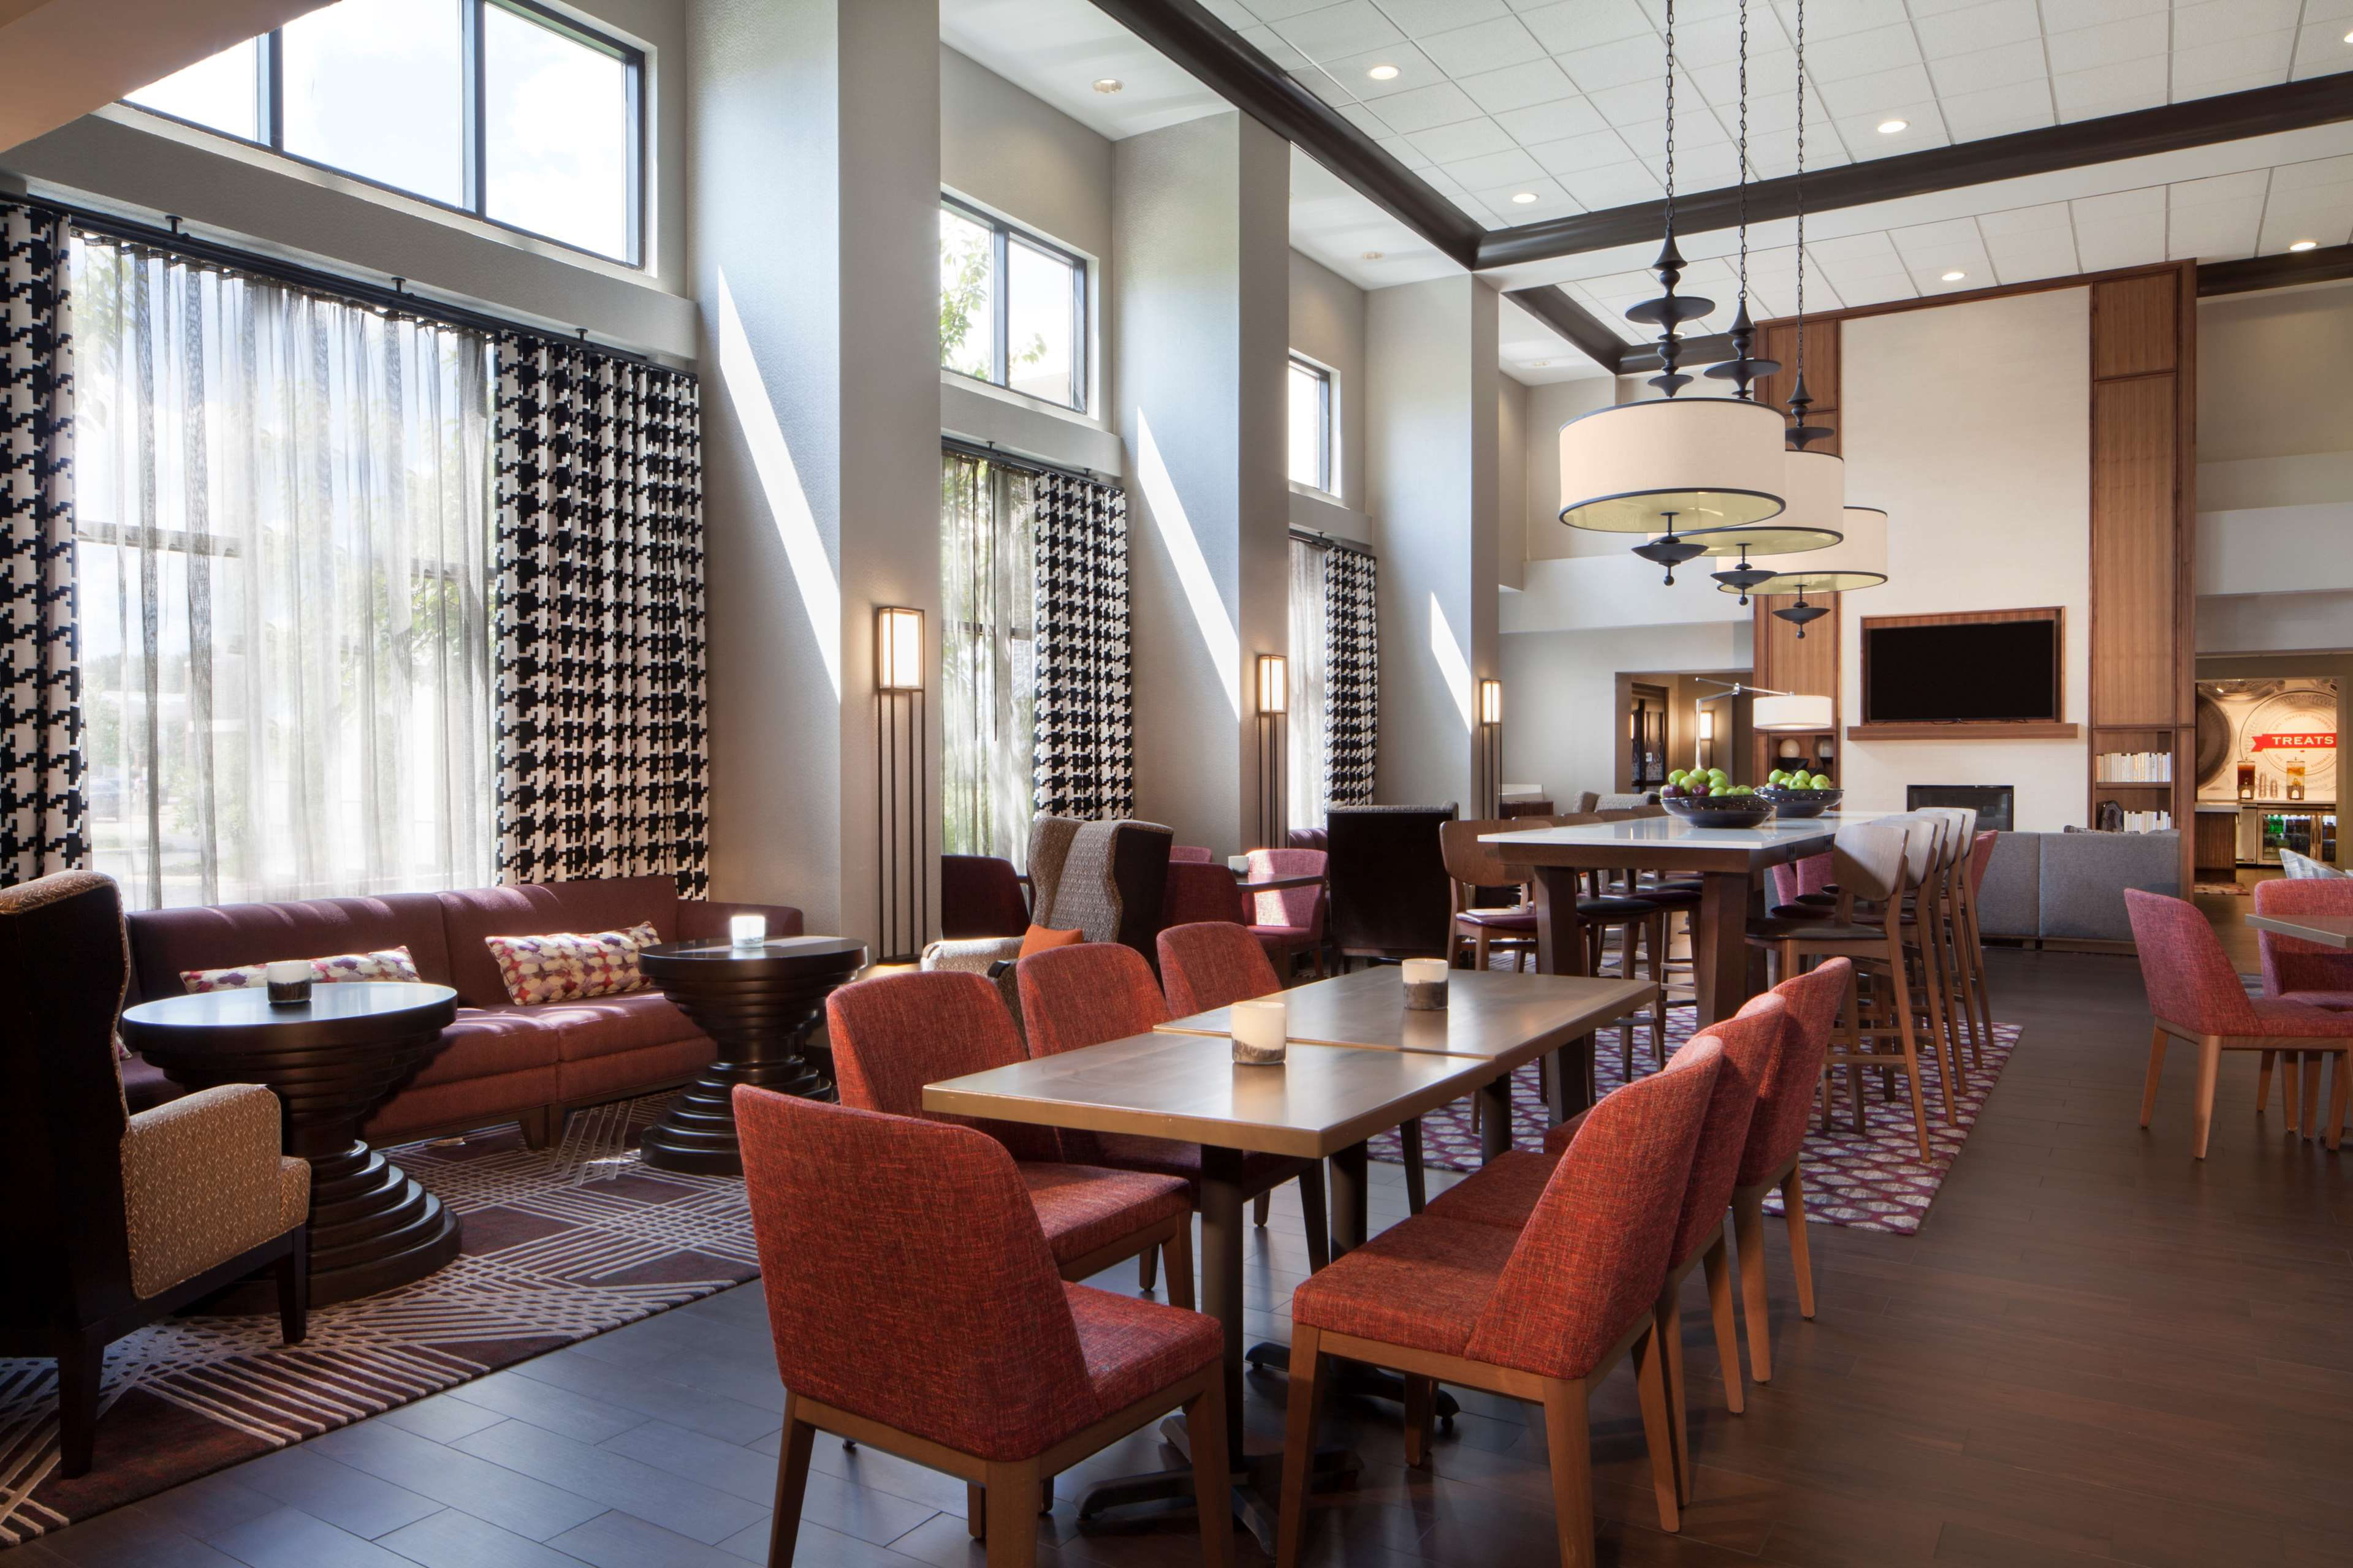 Hampton Inn & Suites Columbus-Easton Area image 3